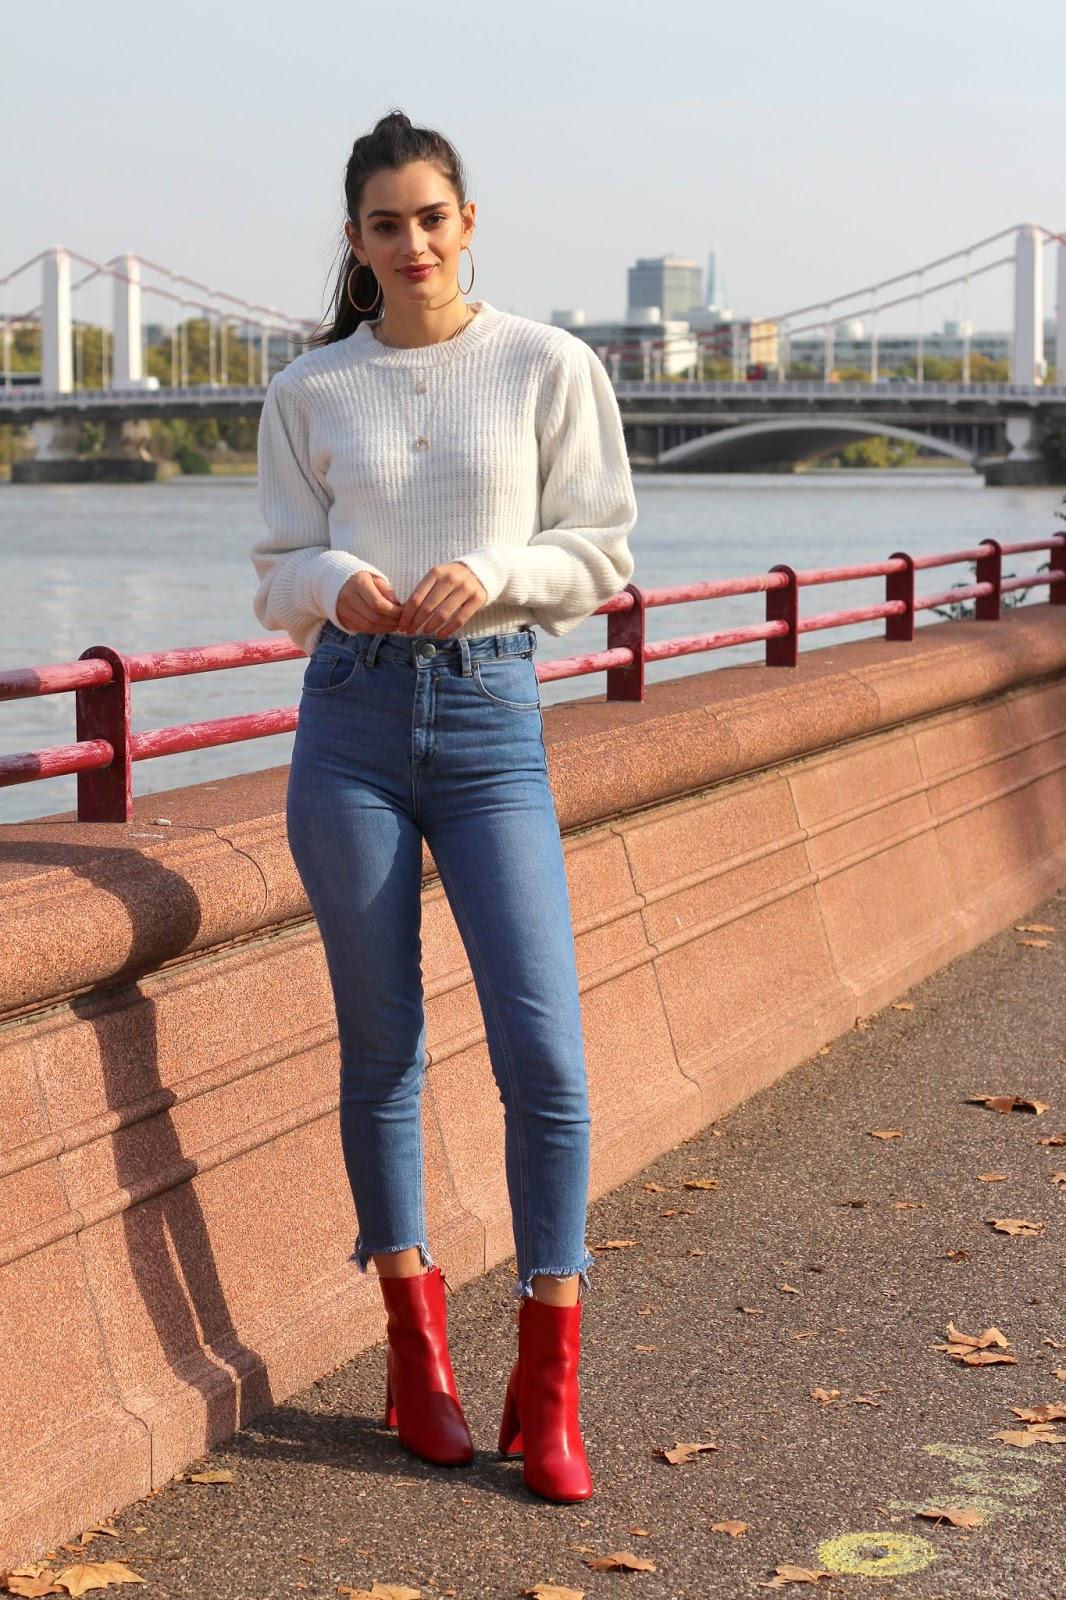 peexo lifestyle fashion blog london